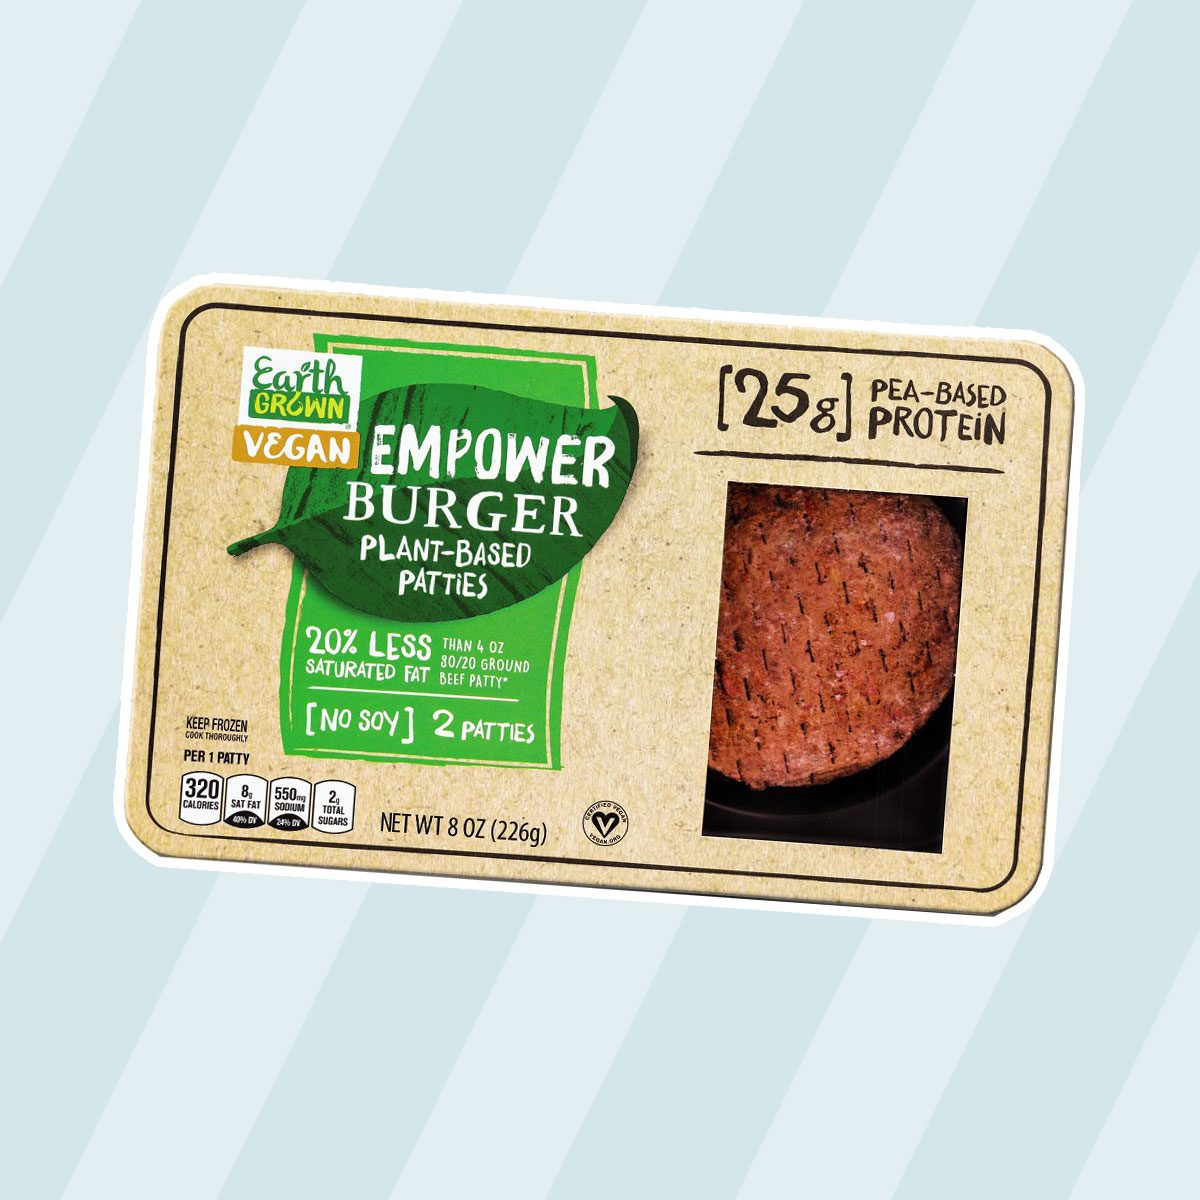 Earth Grown Empower Burger